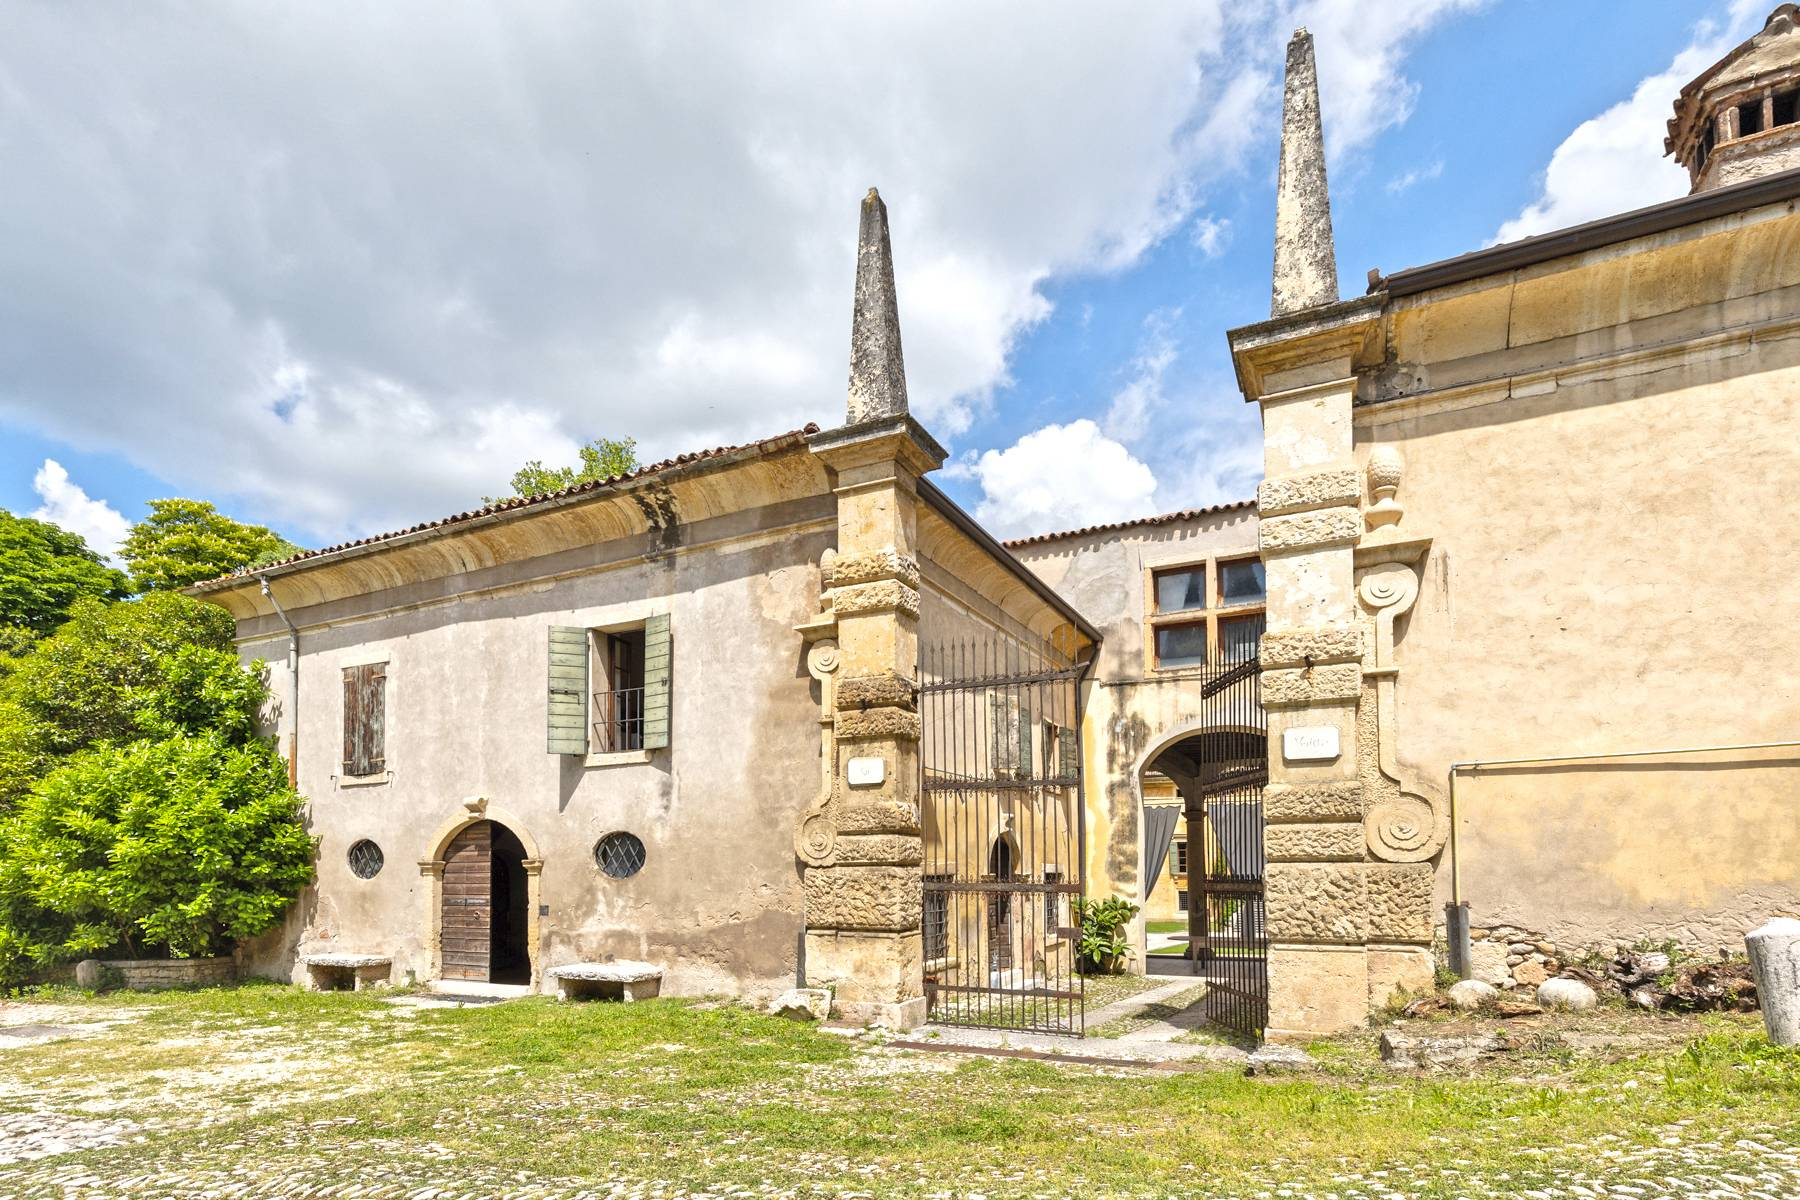 Affascinante villa Veneta a pochi minuti da Verona - 14